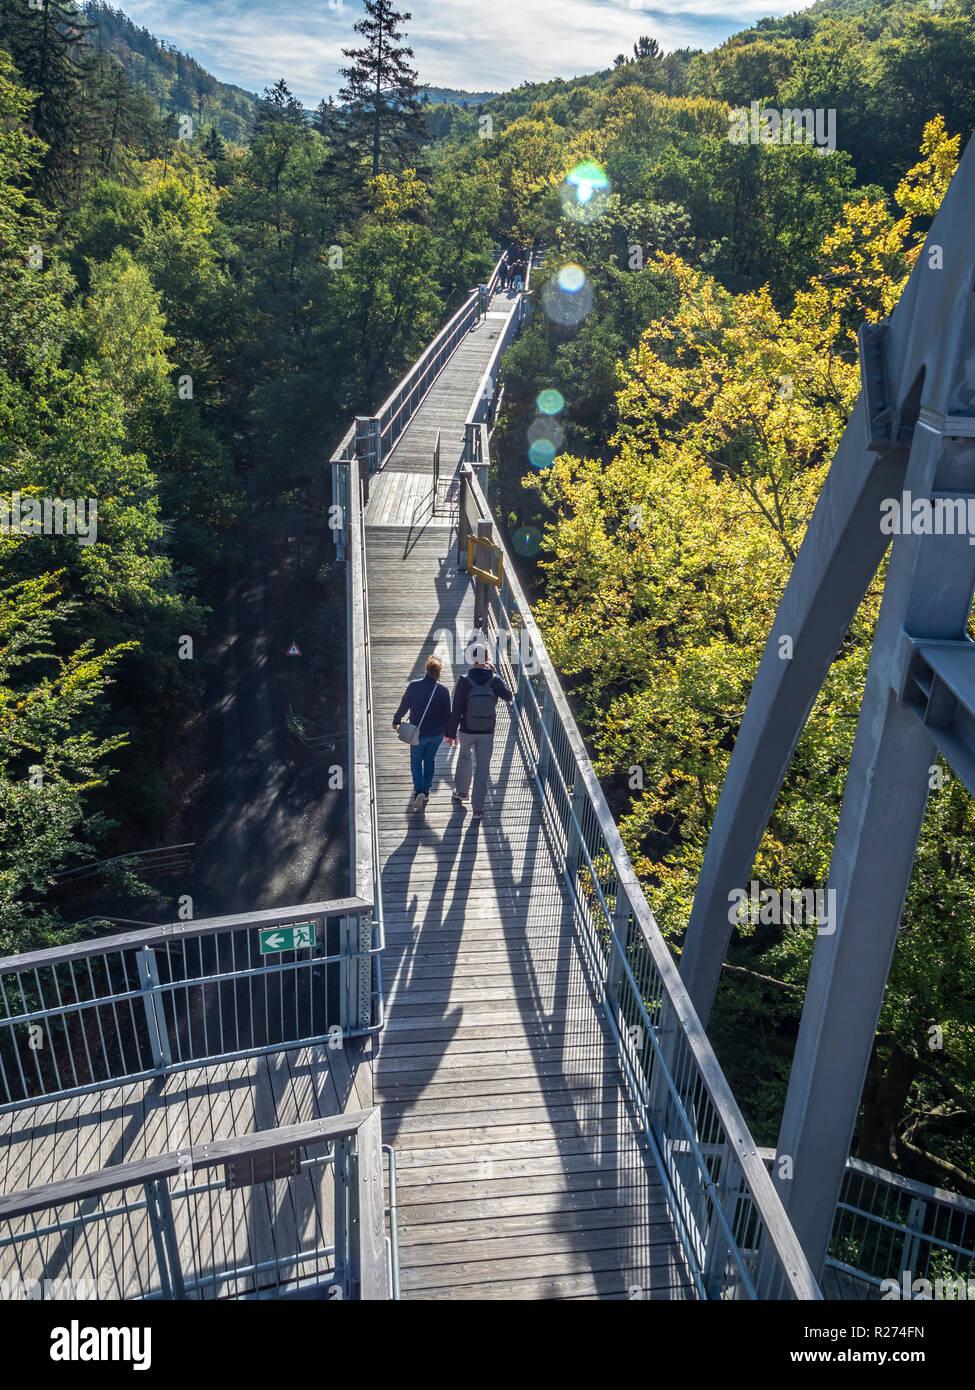 """Baumwipfelpfad"", Treetop walkway through a forest in autumn, Bad Harzburg, Harz mountain range, Lower Saxony, Germany Stock Photo"